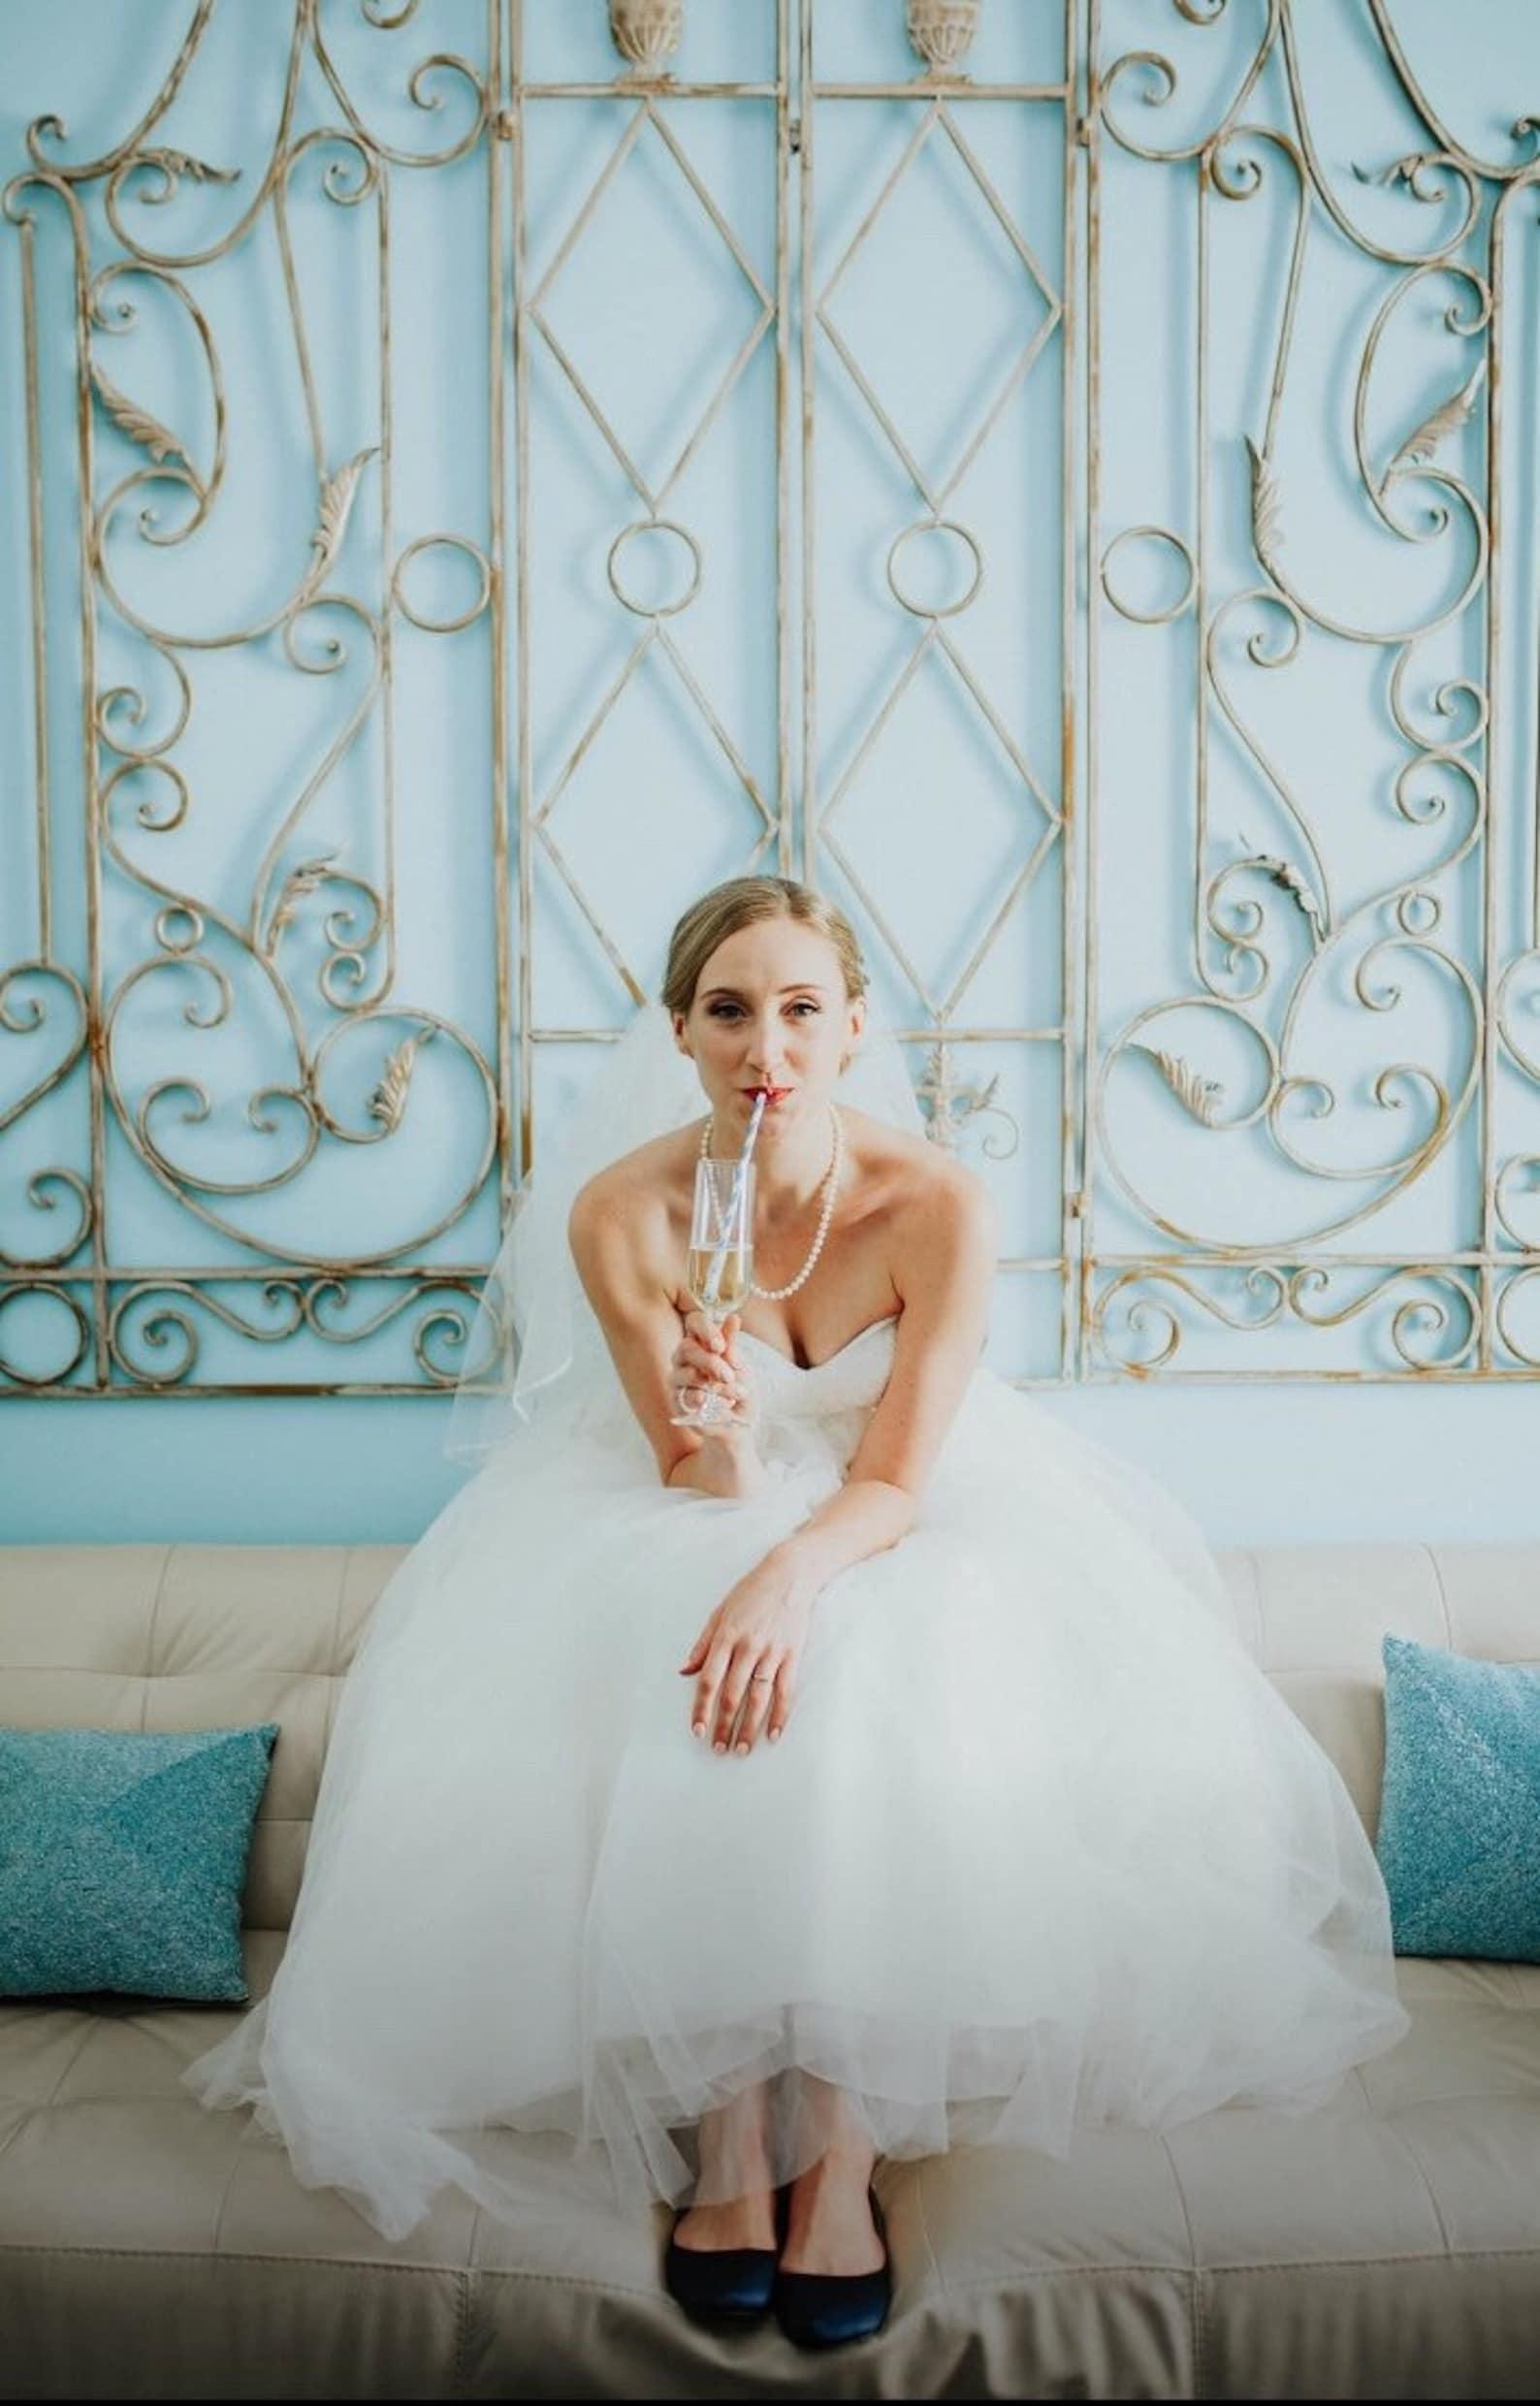 wedding shoes - navy blue bridal ballet flats, low wedding shoes,navy wedding flats,navy satin flats, navy flats,blue flats with